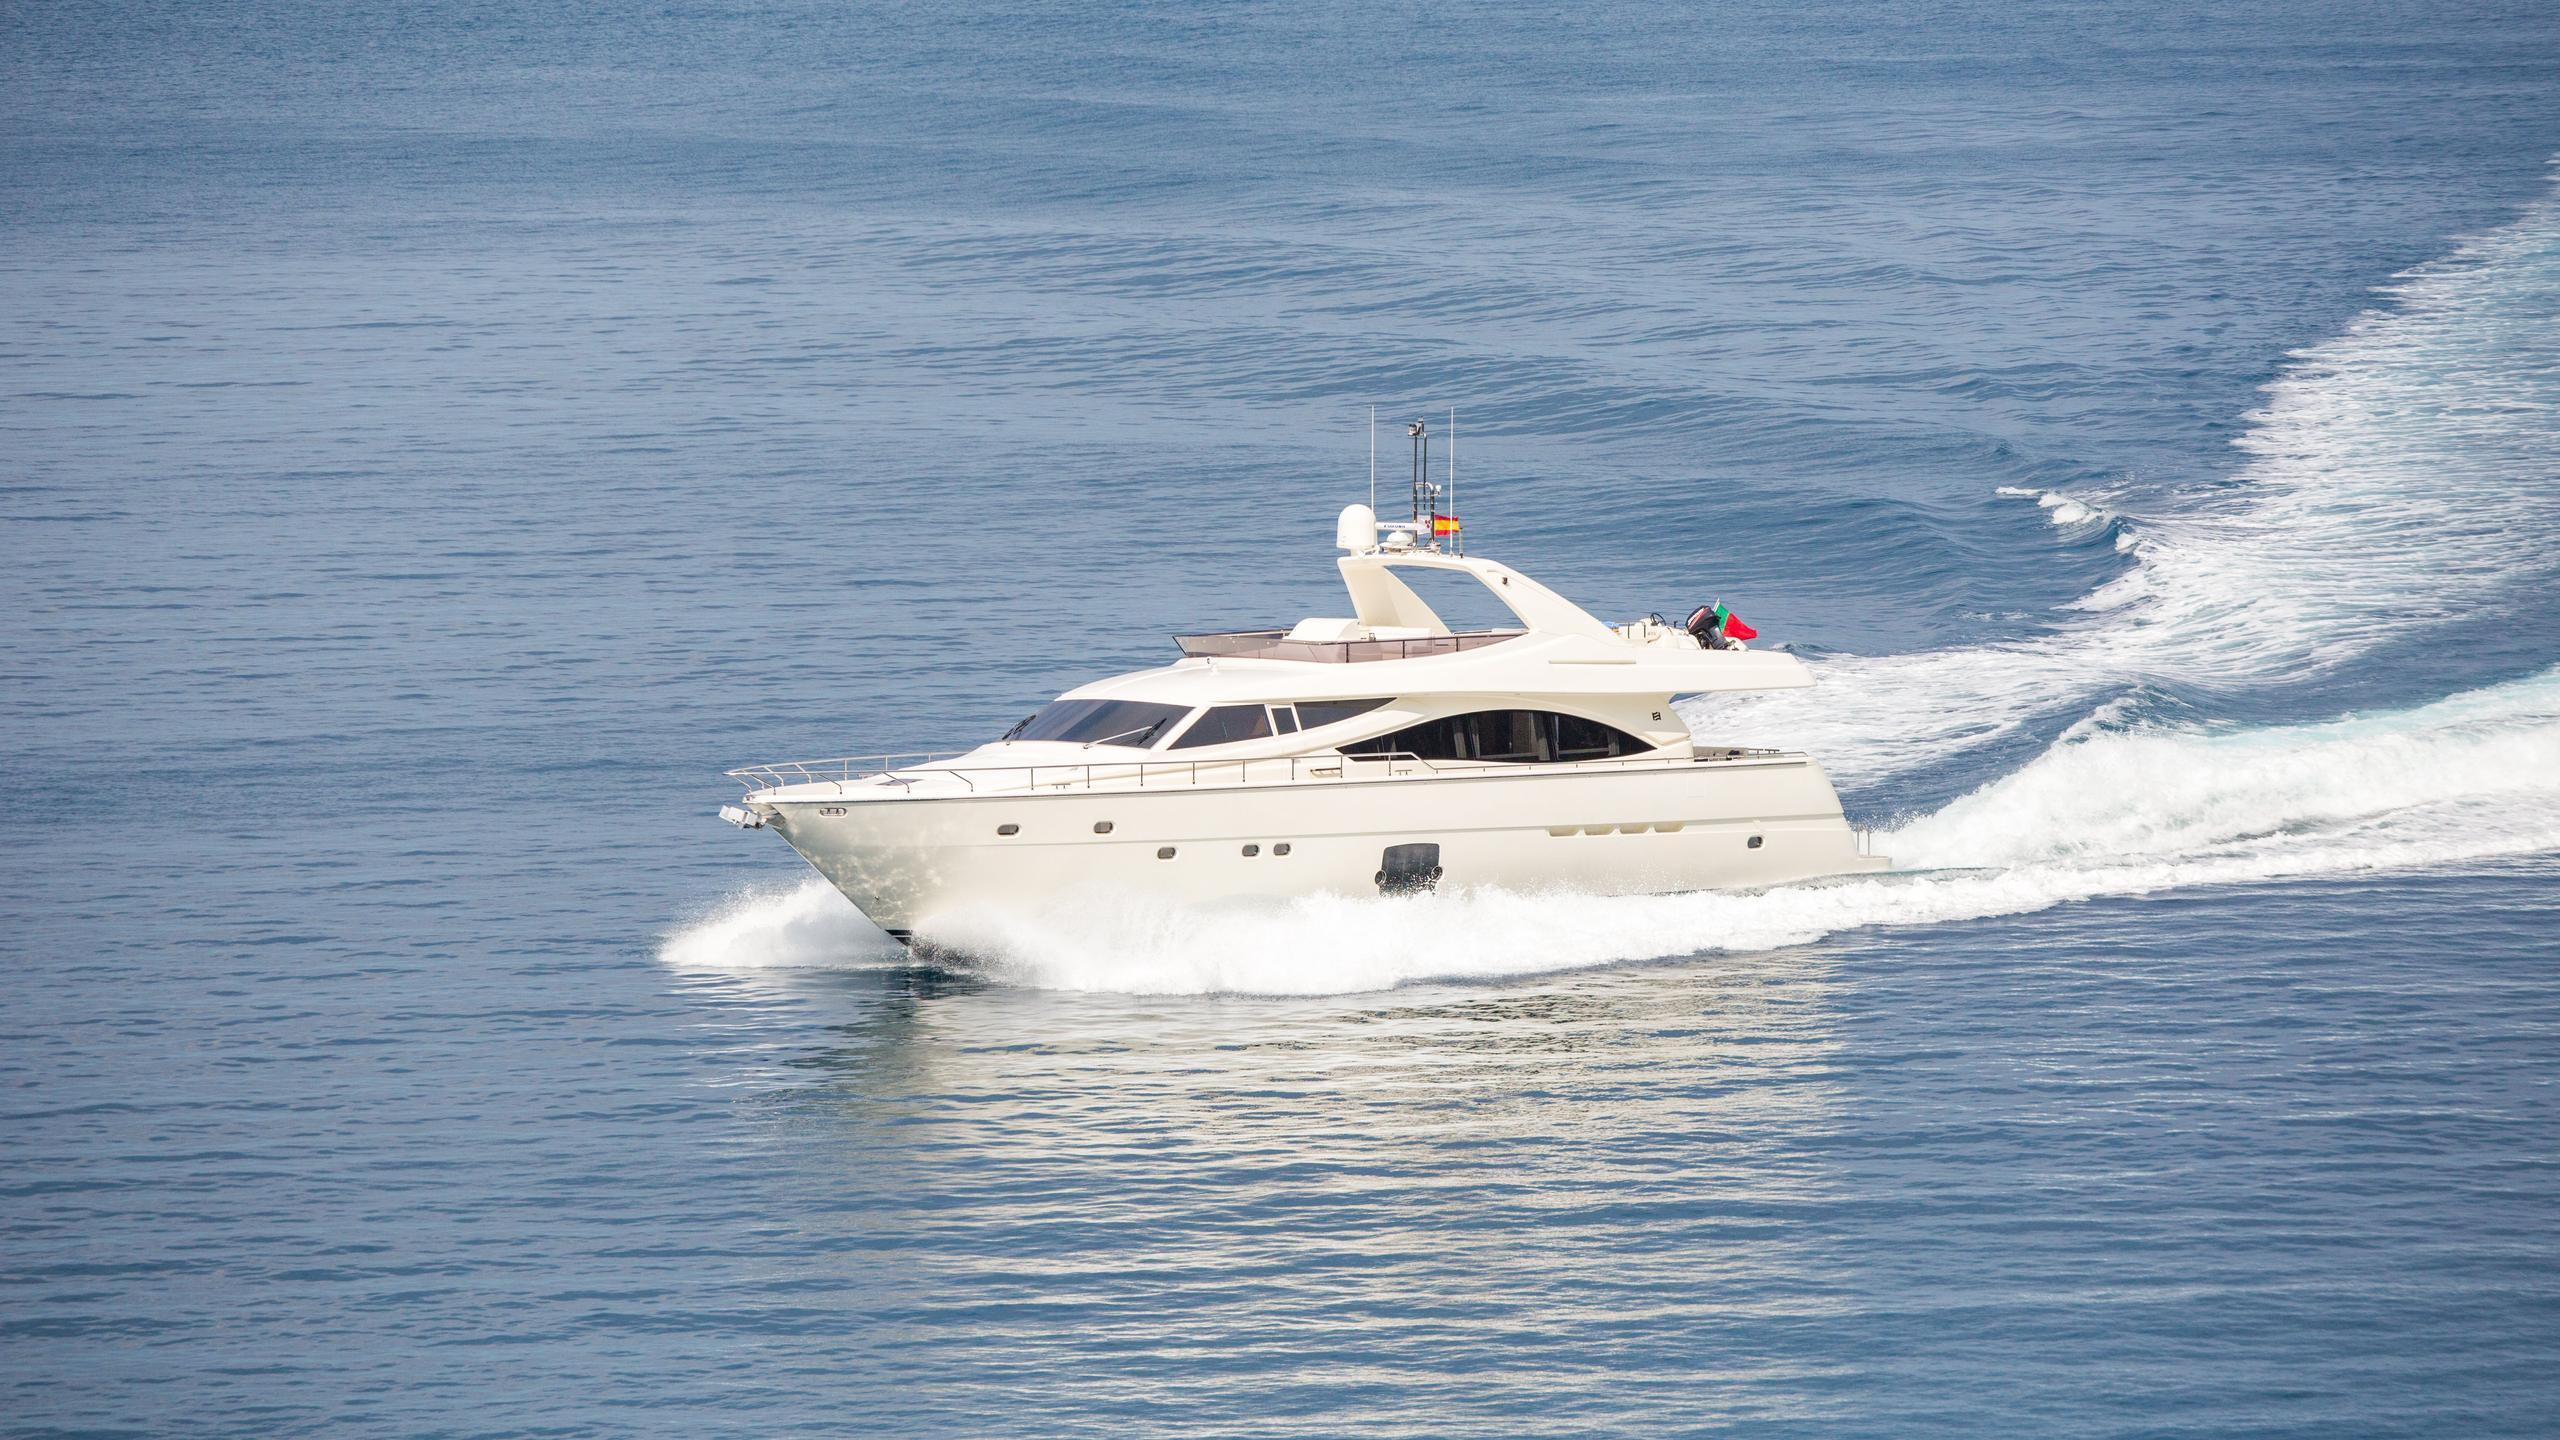 monticello-ii-yacht-cruising